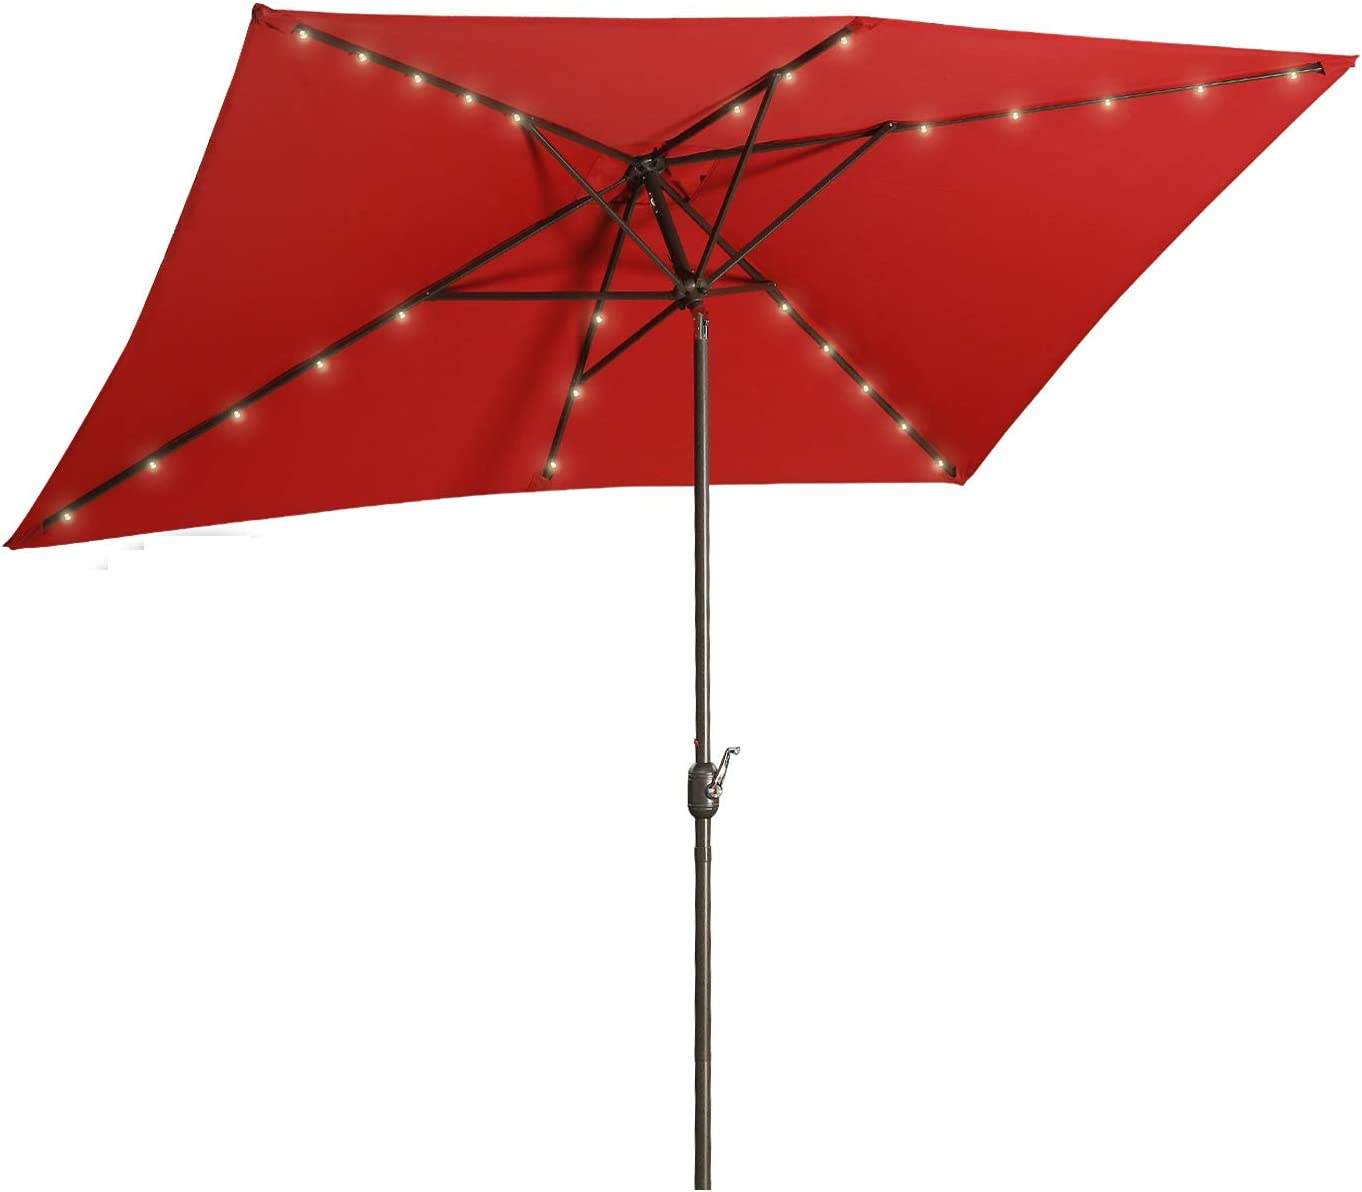 Aok Garden 6.5×10 ft Rectangular Patio Umbrella with Solar Lights Outdoor Table Umbrella with Push Button Tilt & Crank 6 Sturdy Ribs for Market Deck Backyard, Red